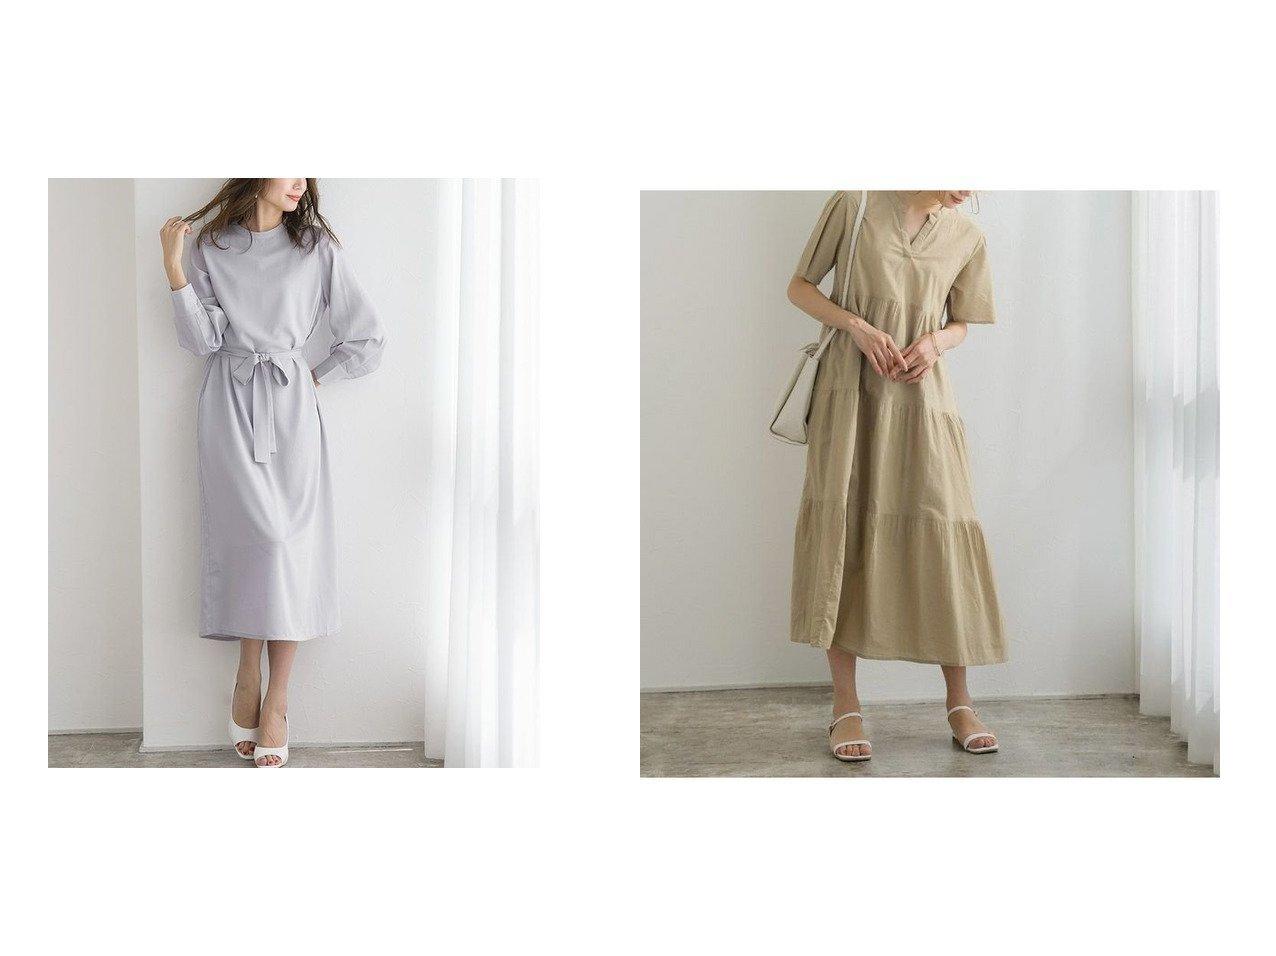 【Pierrot/ピエロ】のスタンドカラーボリュームスリーブワンピース&ノーカラーティアードワンピース おすすめ!人気!プチプライスで上品なファッションアイテムの通販  おすすめで人気の流行・トレンド、ファッションの通販商品 メンズファッション・キッズファッション・インテリア・家具・レディースファッション・服の通販 founy(ファニー) https://founy.com/ ファッション Fashion レディースファッション WOMEN ワンピース Dress シンプル スタンド フェミニン プチプライス・低価格 Affordable  ID:crp329100000021268